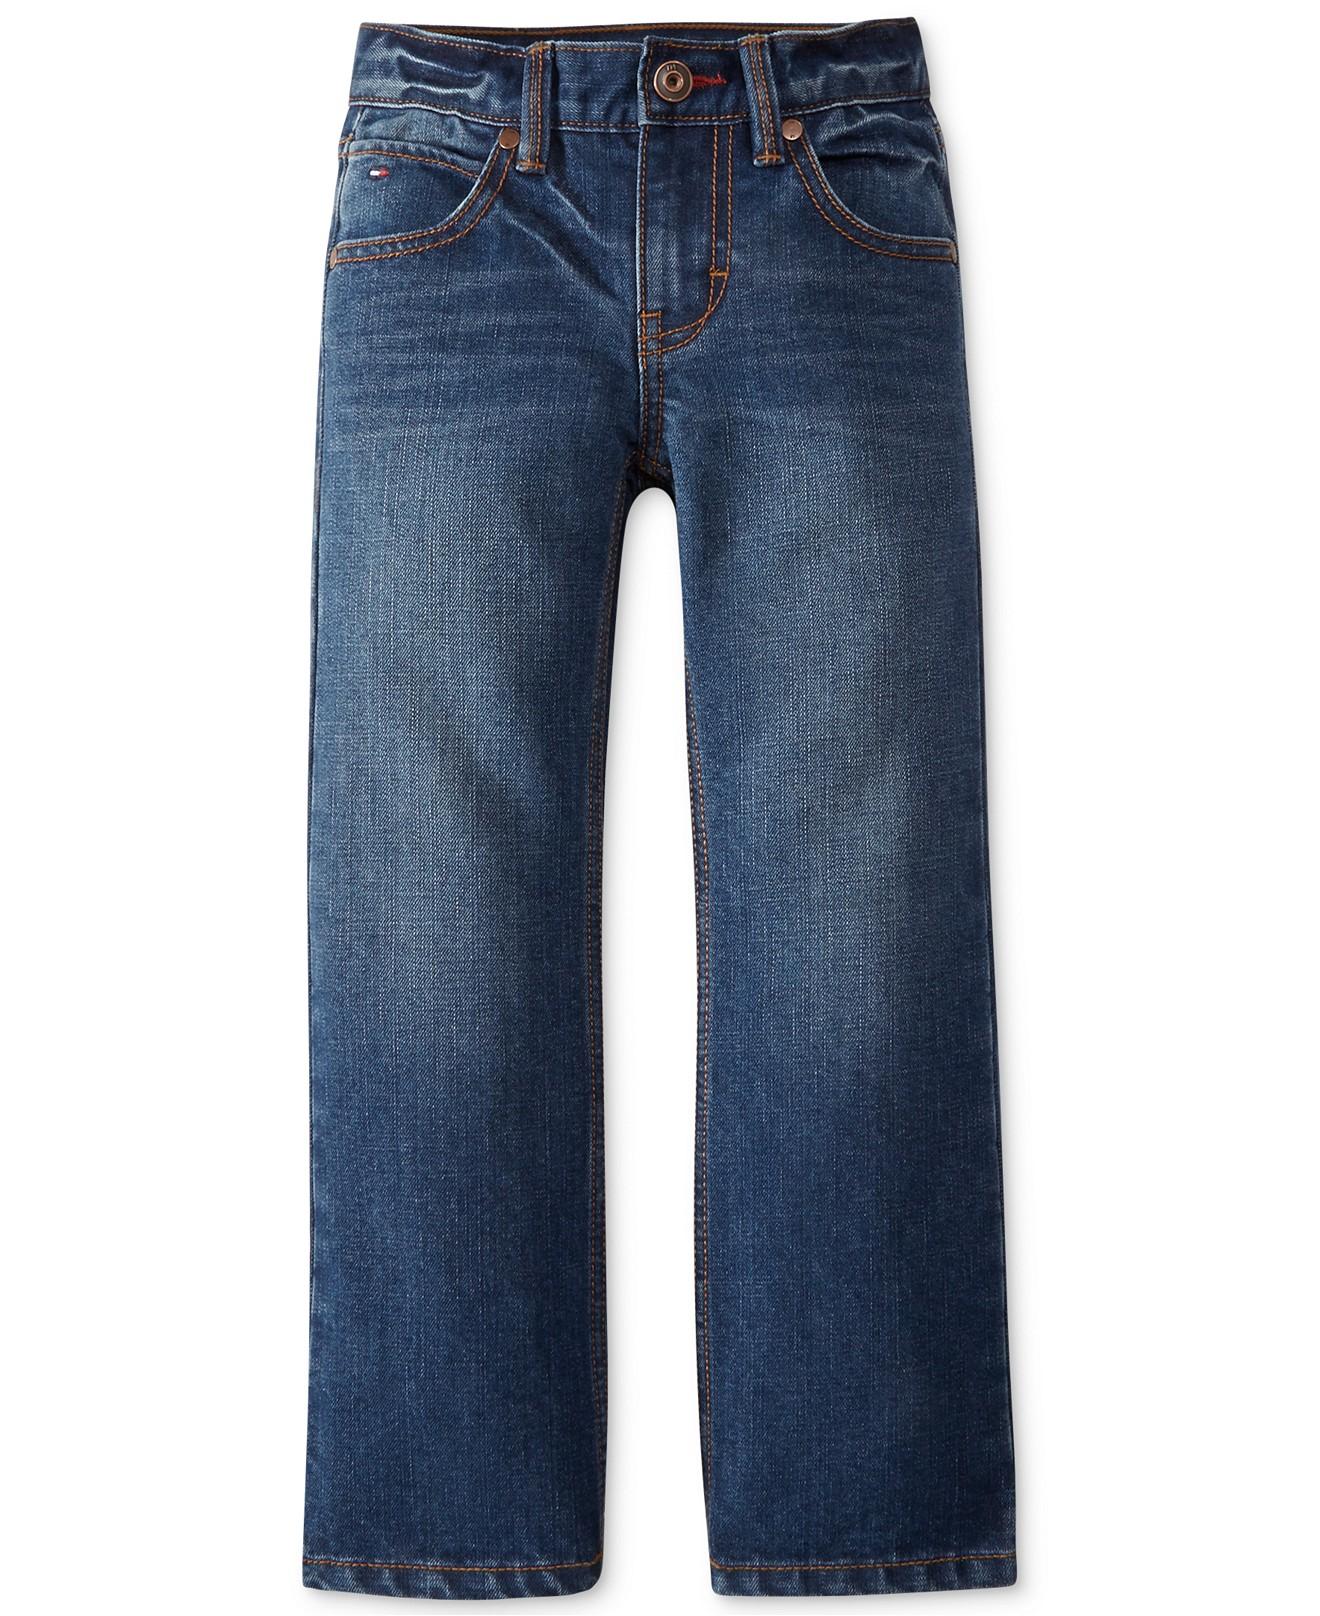 детские штаны Tommy hilfiger  2015 ML футболка детская tommy hilfiger 2015 polo ml